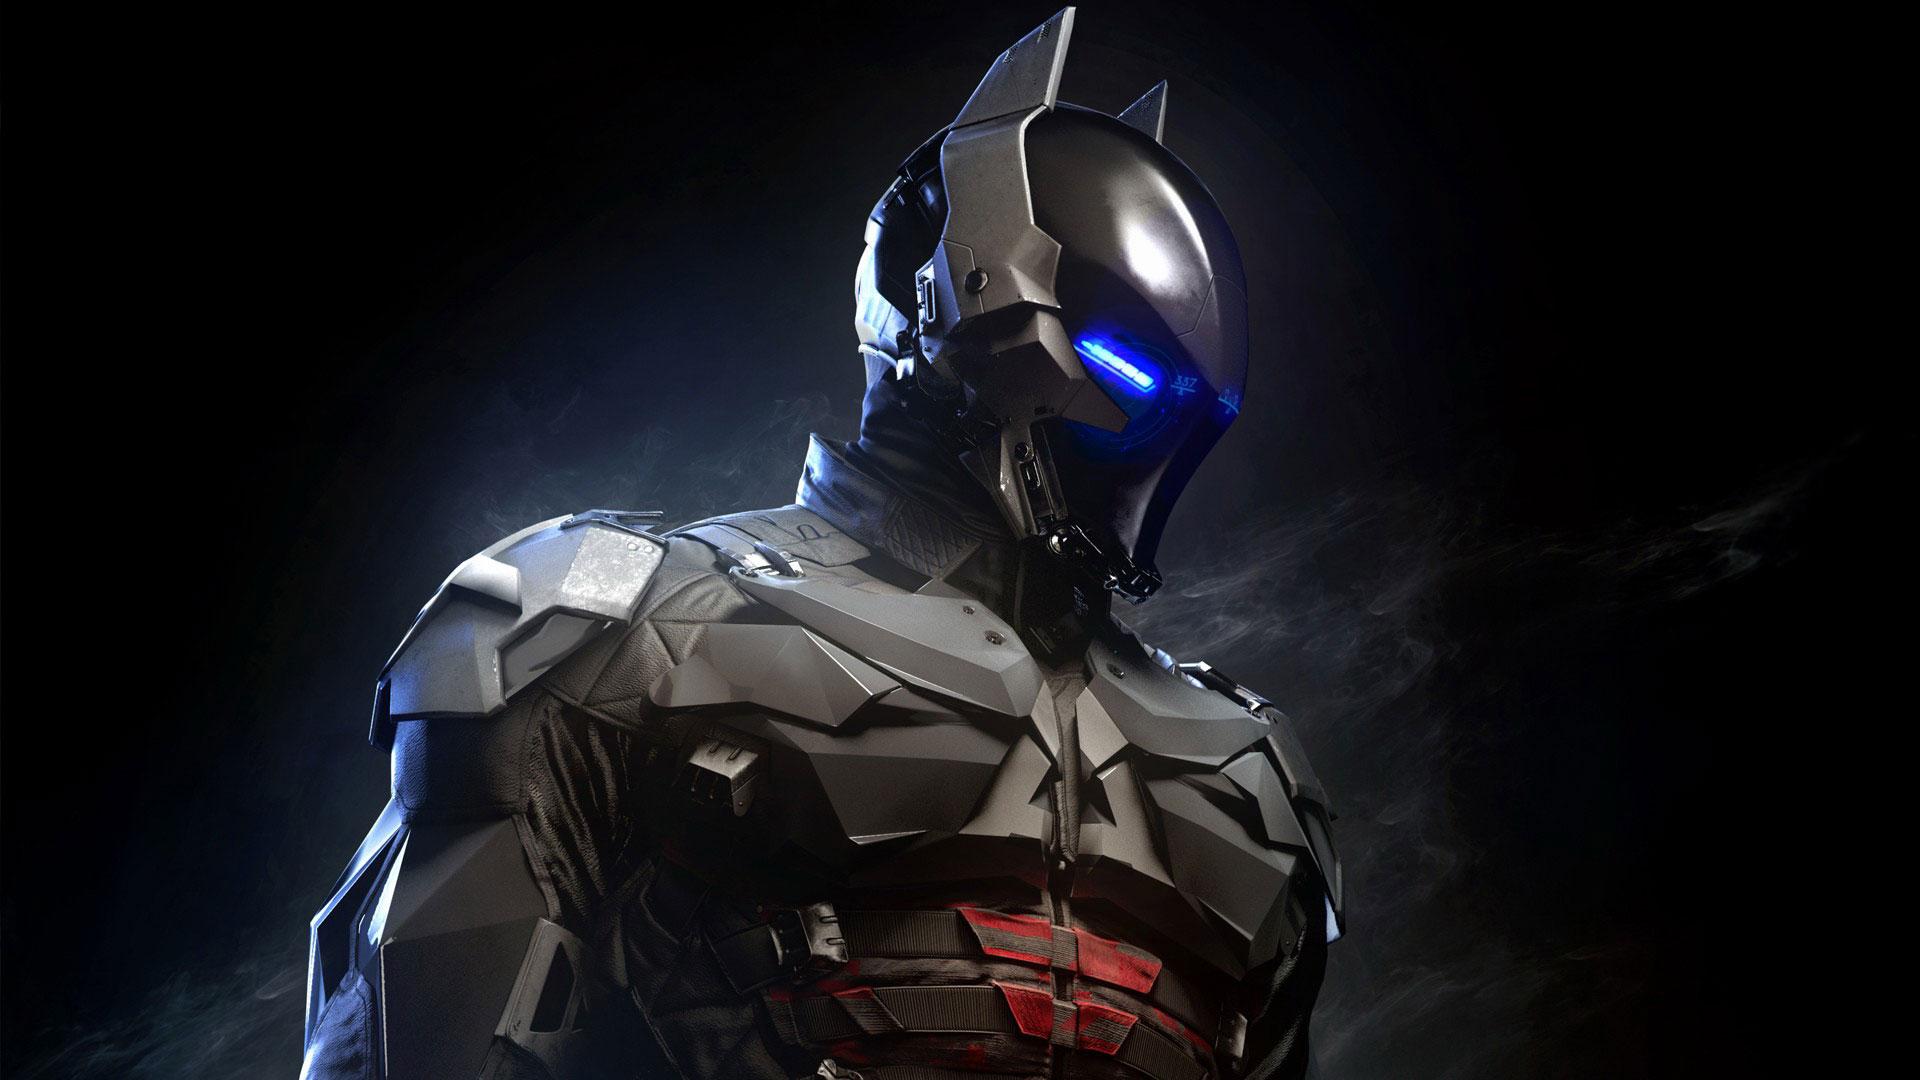 sedge蝙蝠侠壁纸_